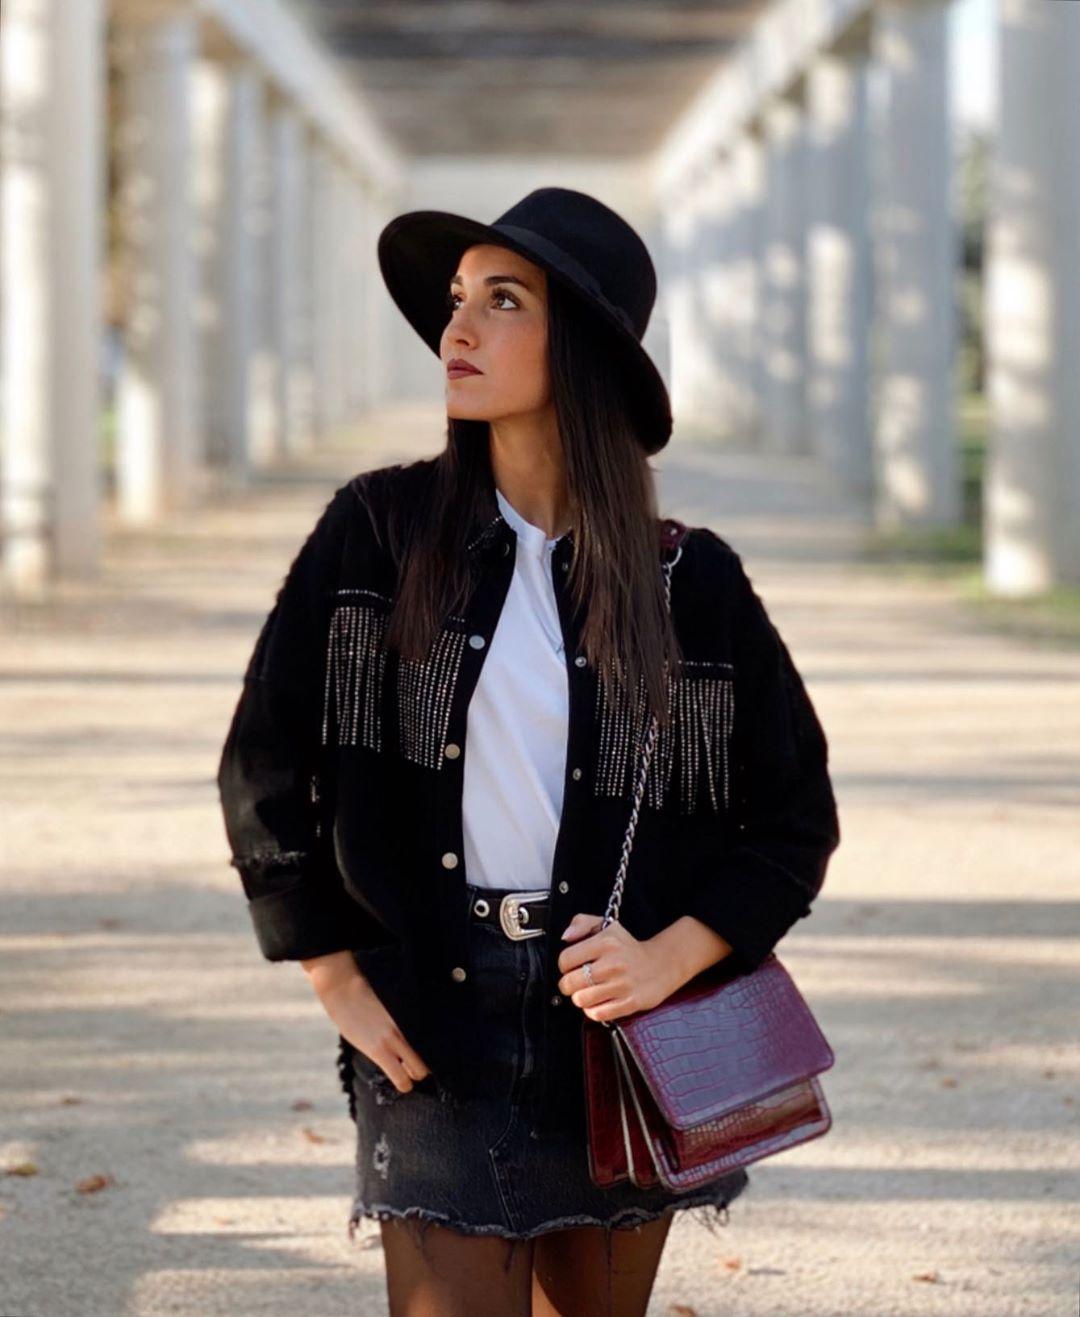 fringed jacket with shiny effect de Zara sur carlapg_